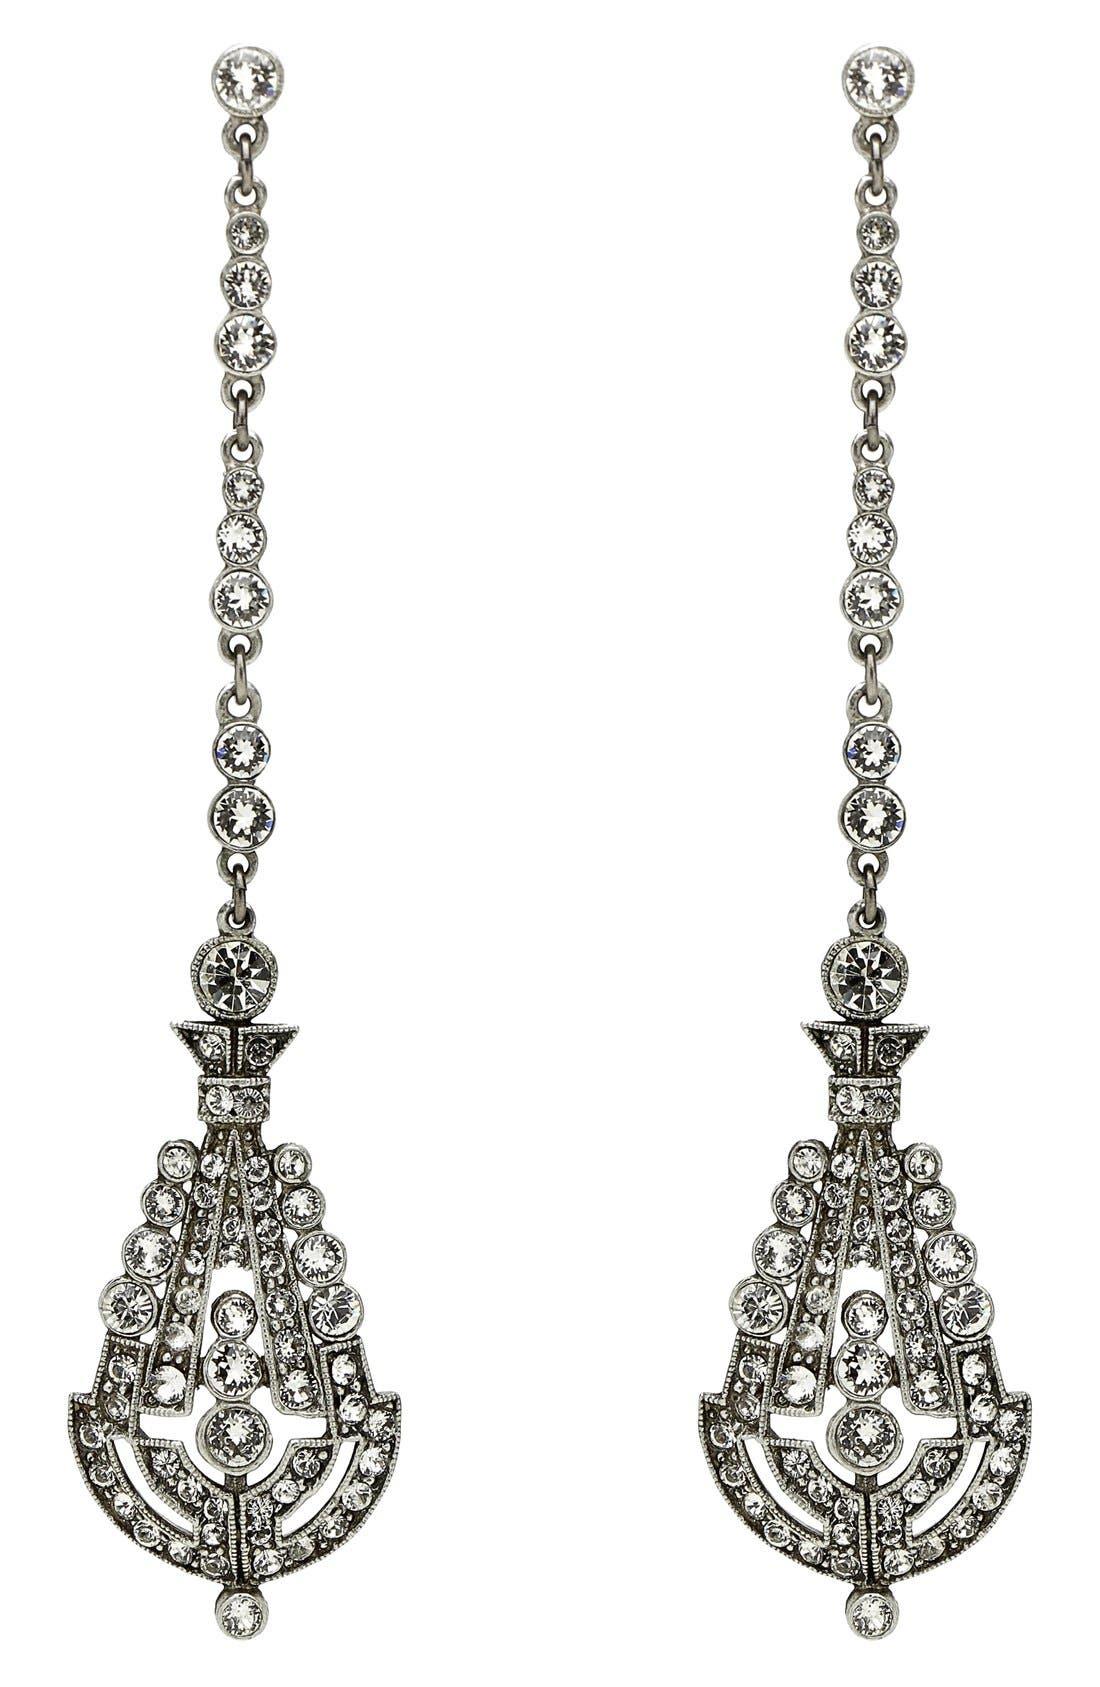 'Deco' Crystal Drop Earrings,                             Main thumbnail 1, color,                             Clear/ Crystal